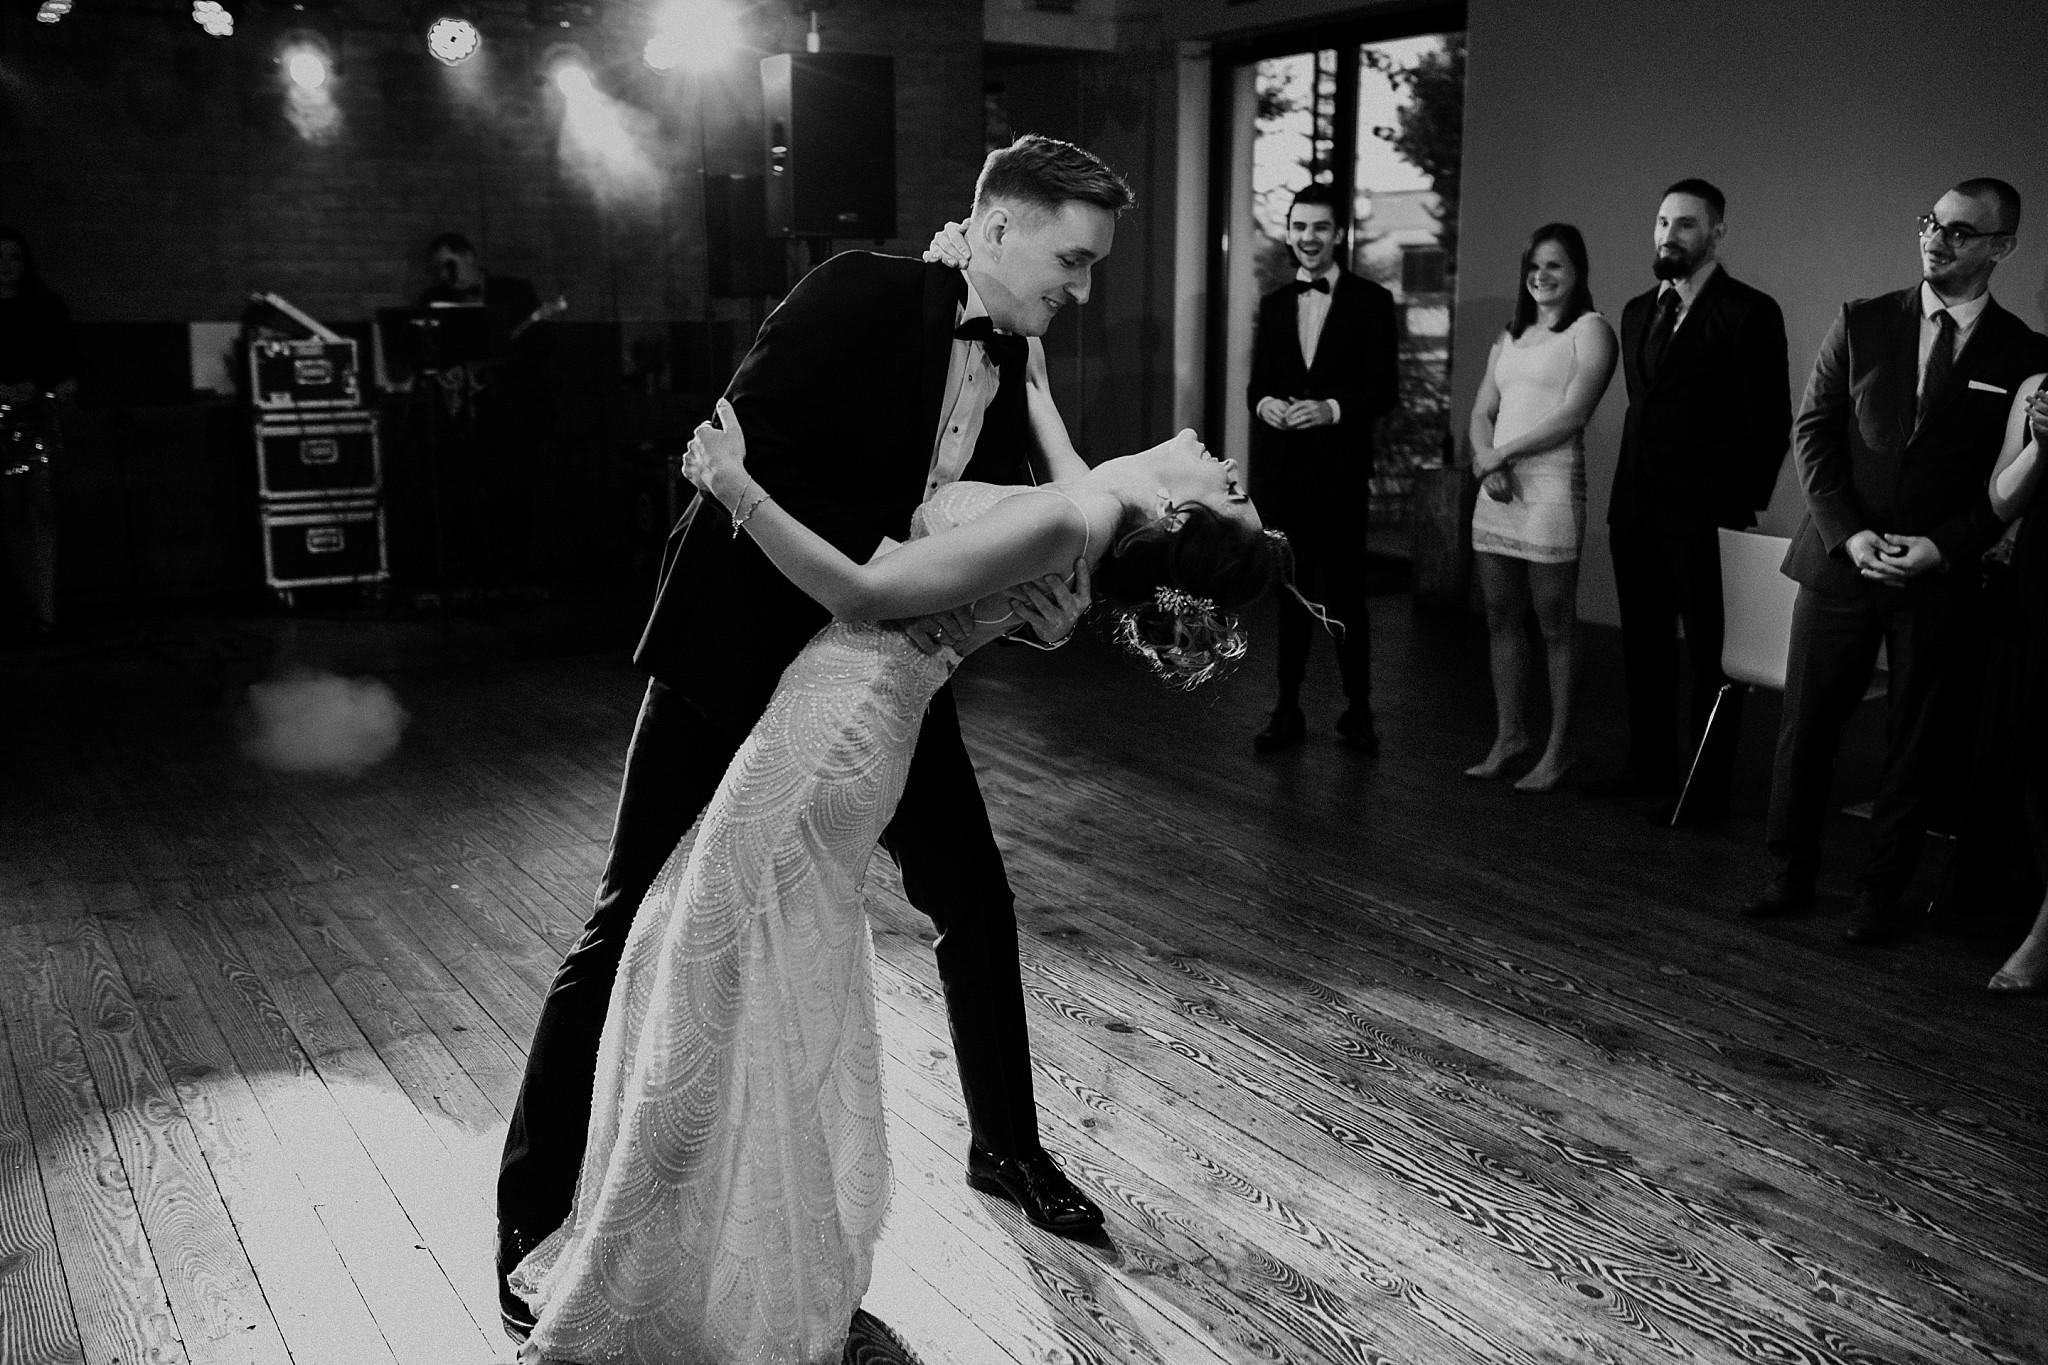 fotograf poznan wesele dobra truskawka piekne wesele pod poznaniem wesele w dobrej truskawce piekna para mloda slub marzen slub koronawirus slub listopad wesele koronawirus 317